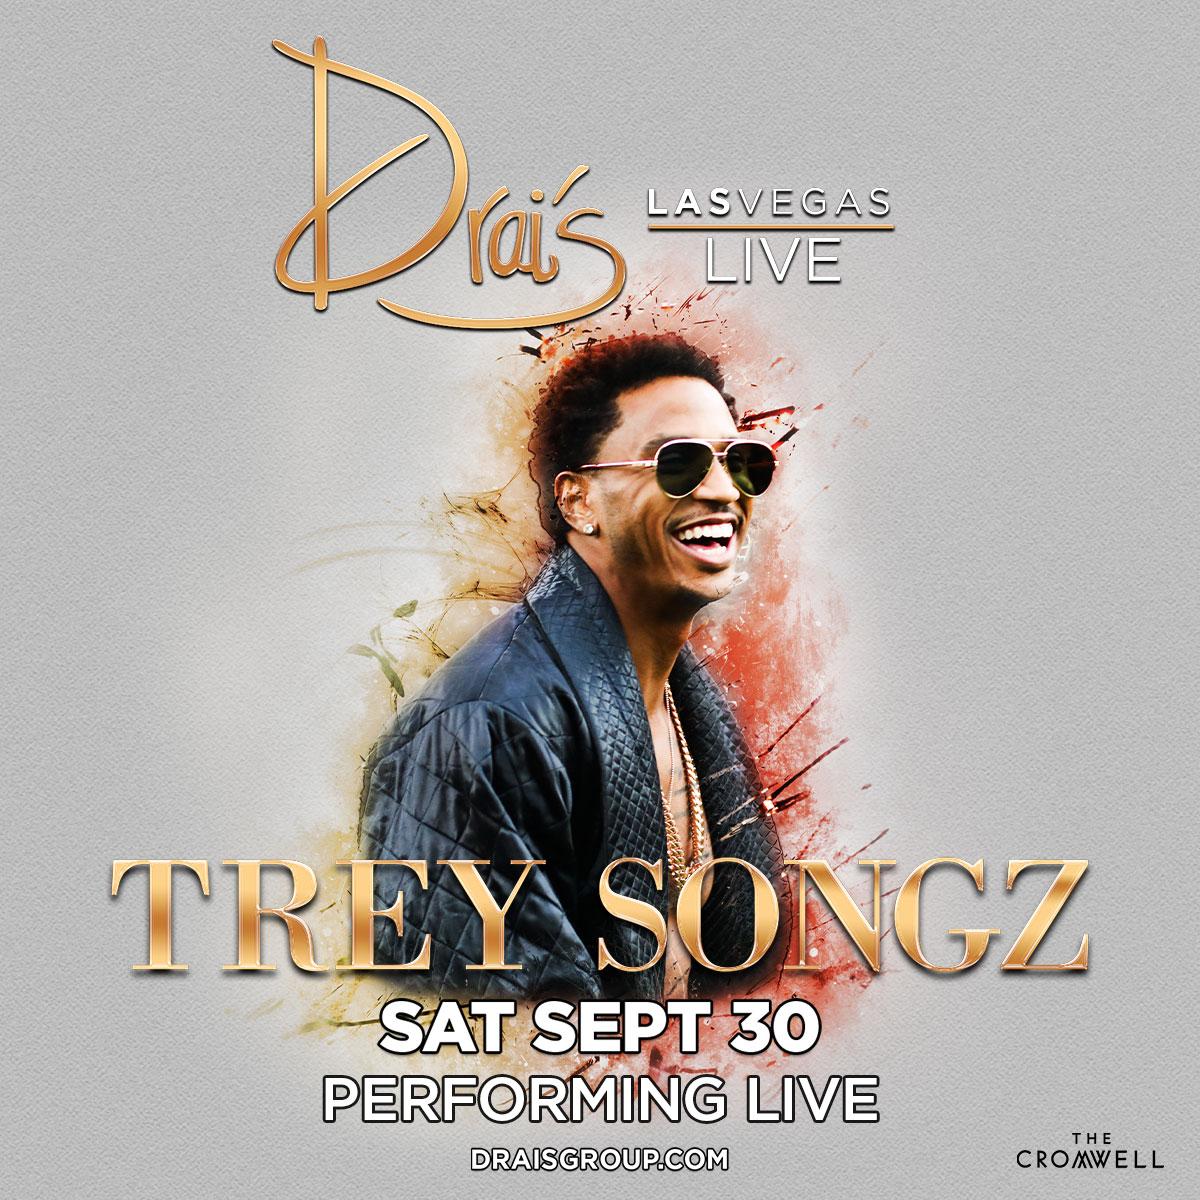 Trey Songz At Drais Nightclub Saturday Sep 30 Guestlist